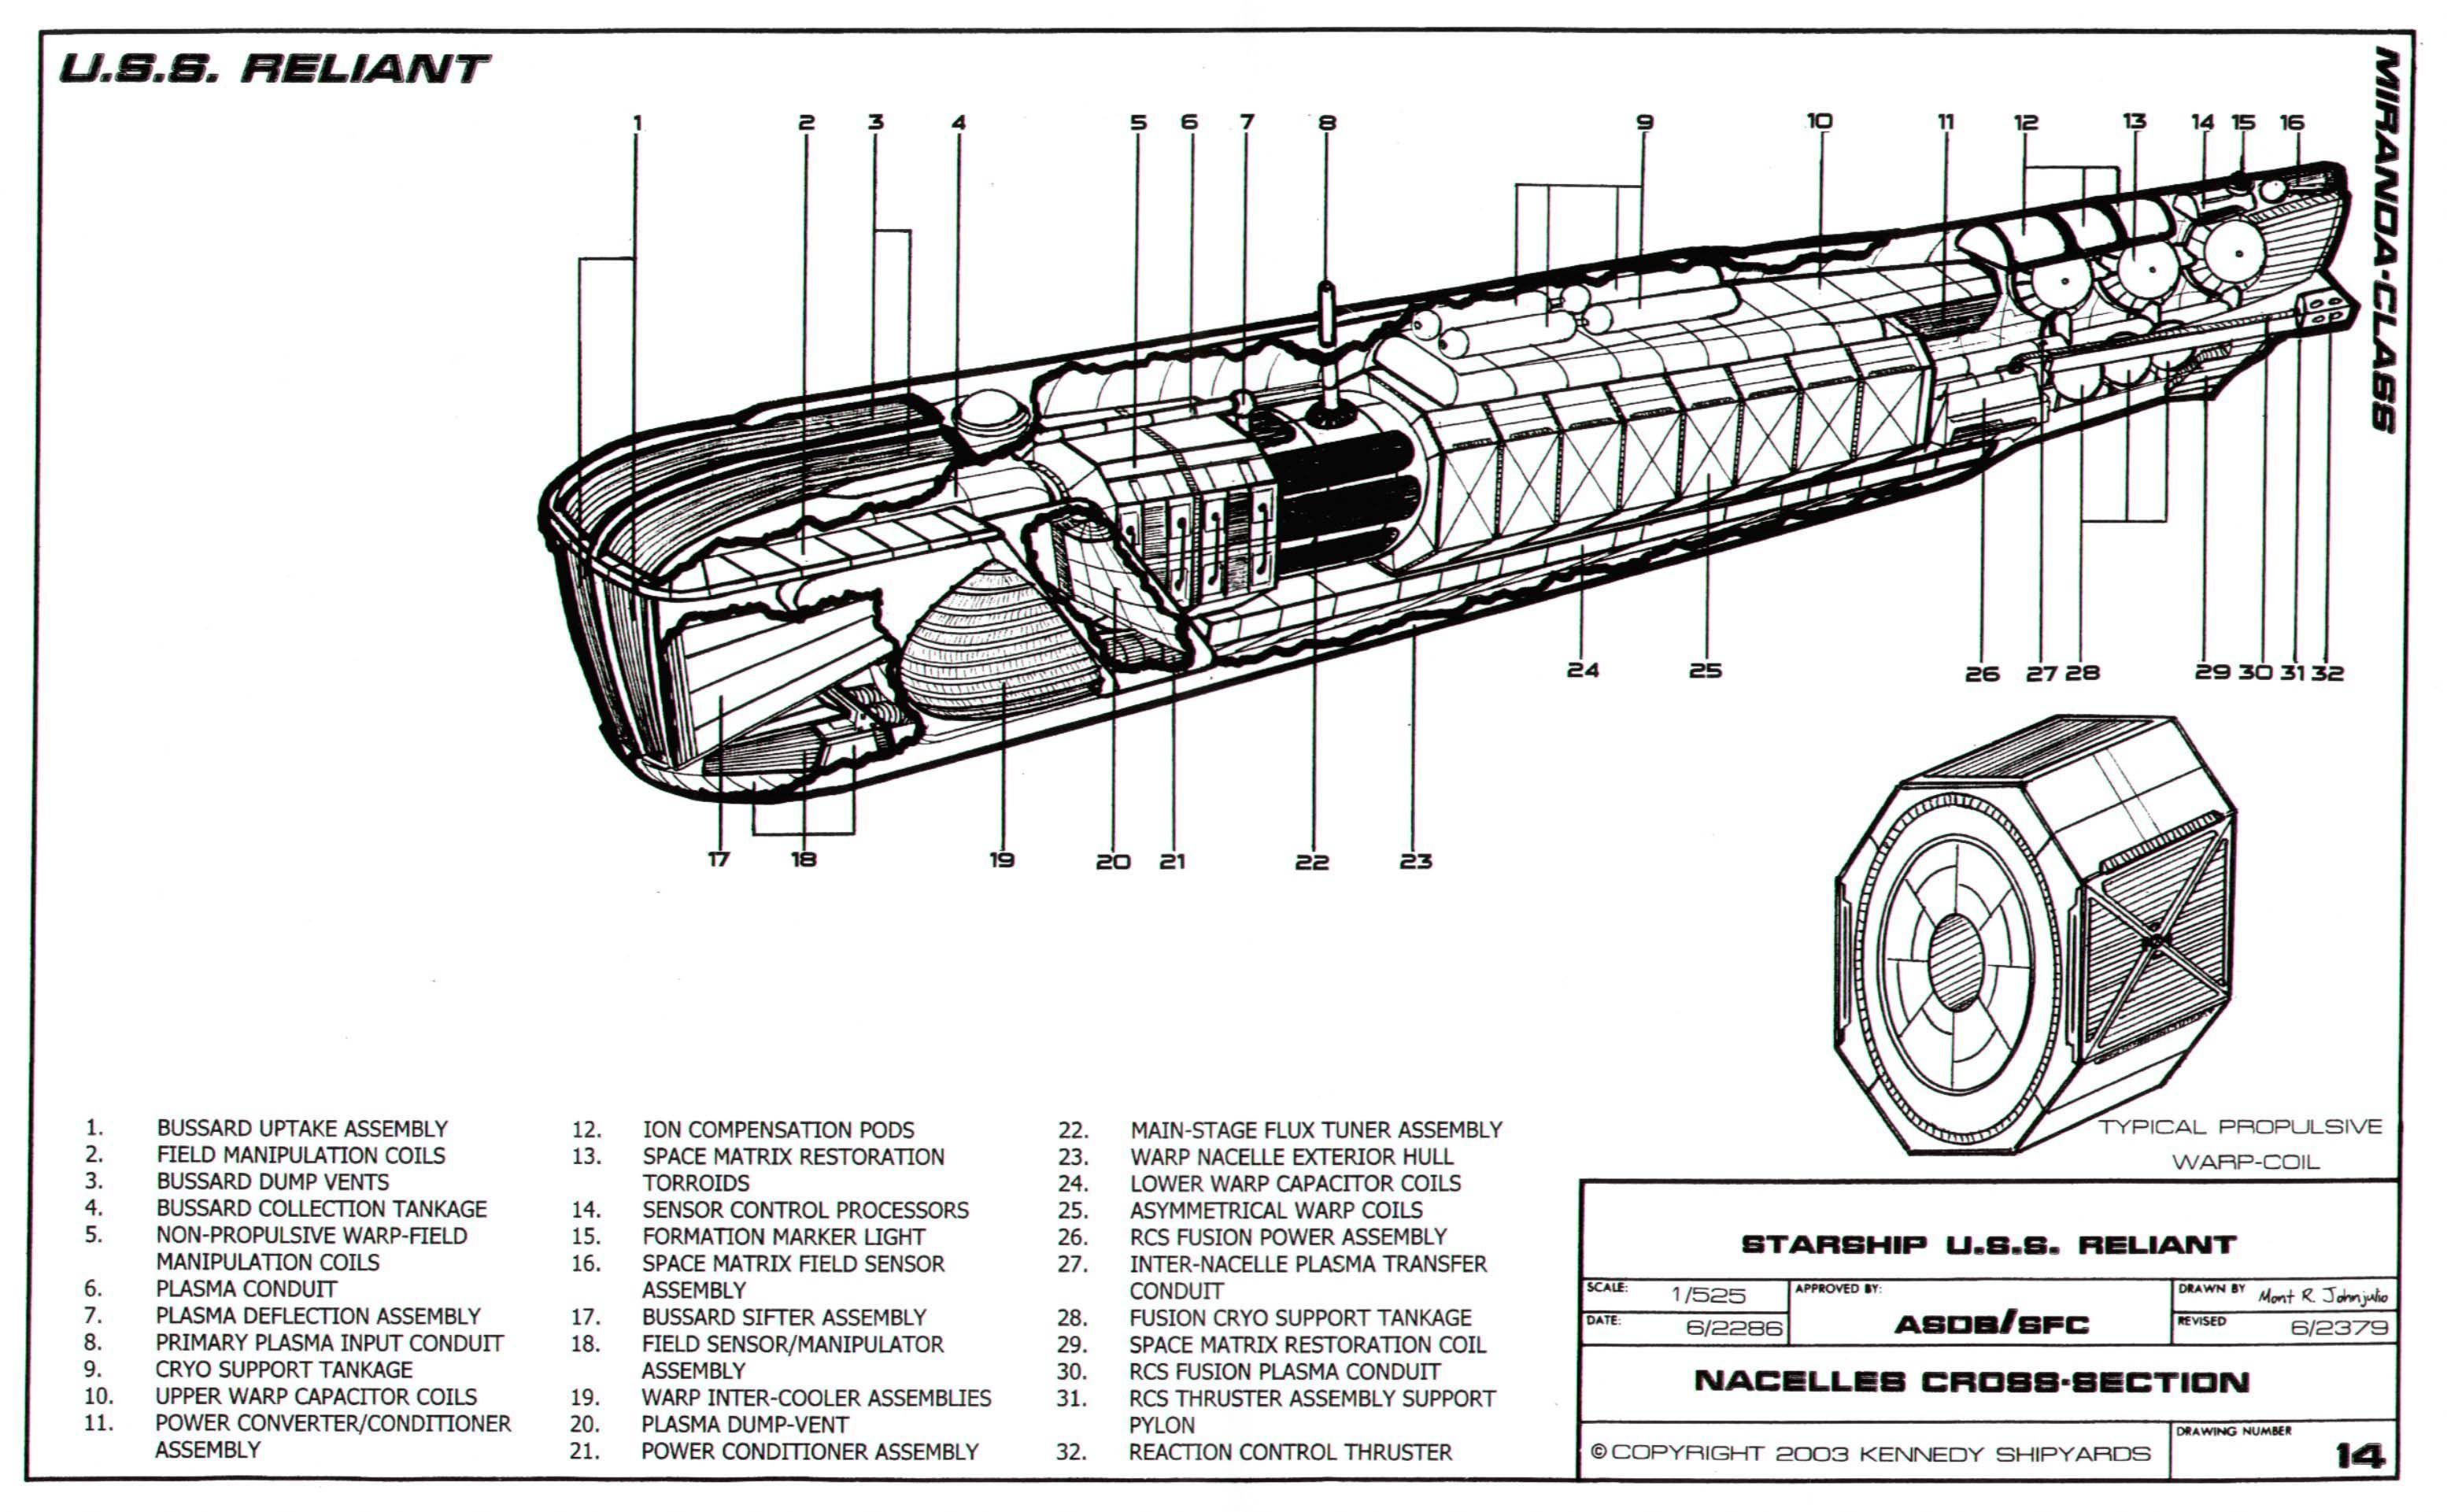 miranda class starship uss reliant ncc 1864 sheet 14 jpg jpeg image 3109 215 1921 pixels